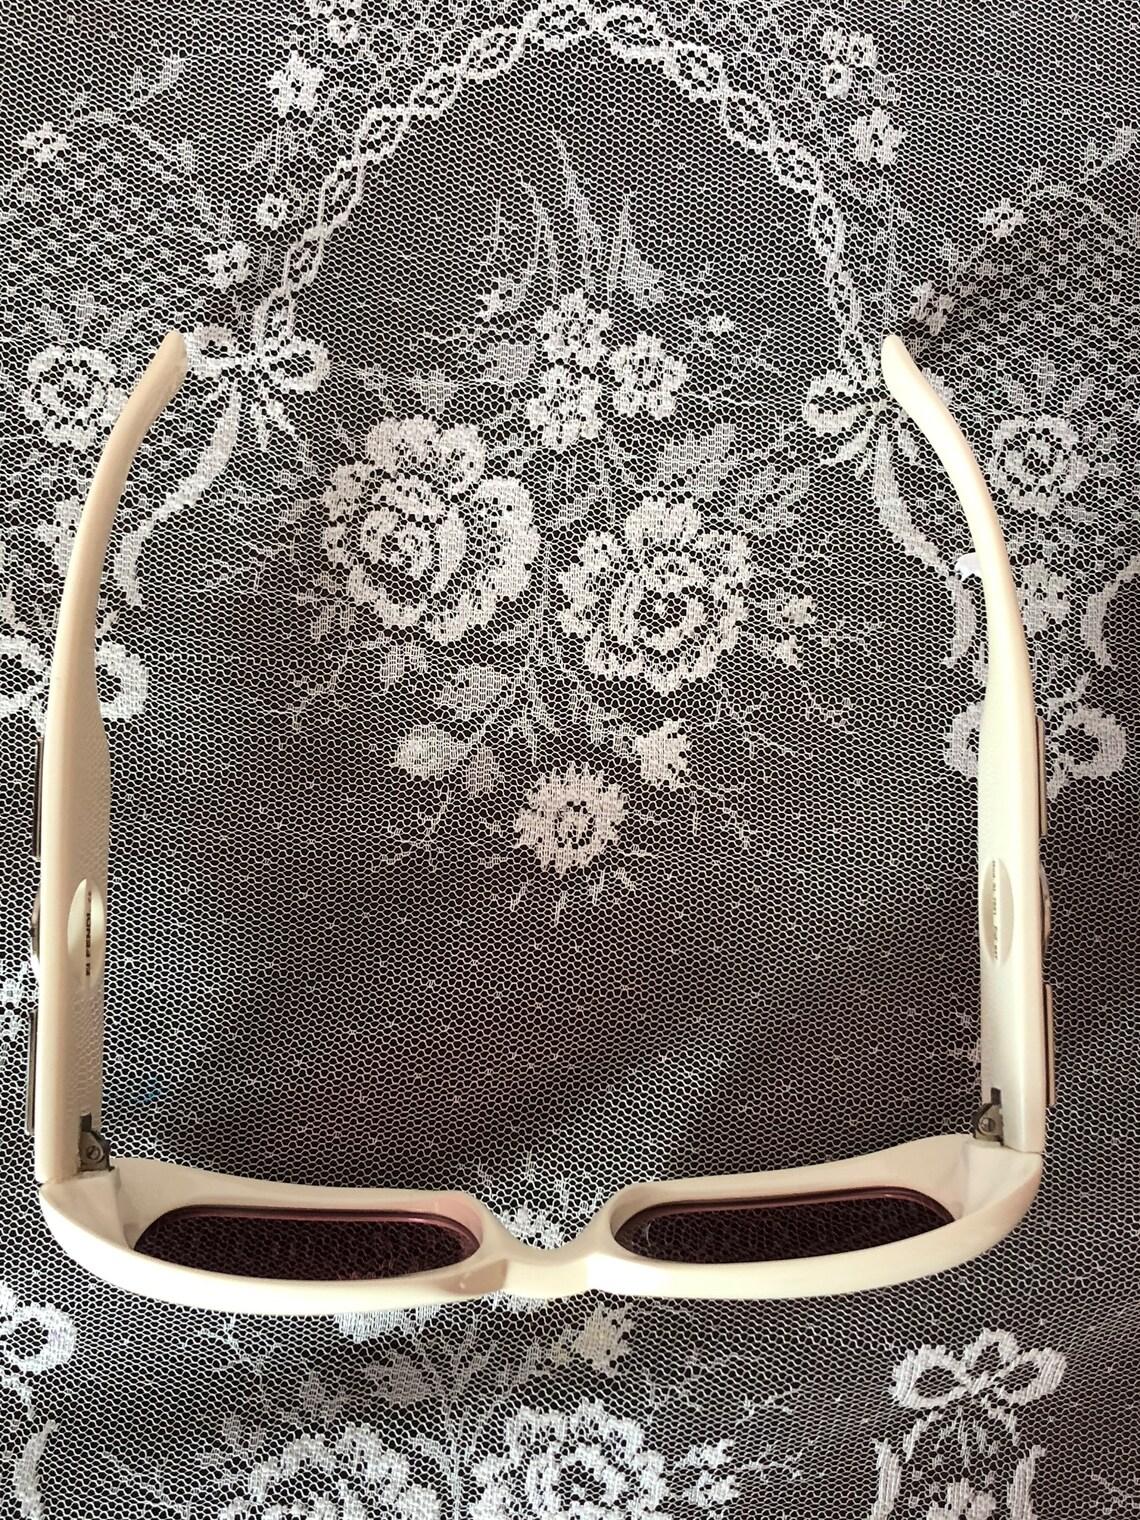 RX5 Dark Oak Eyeglasses with